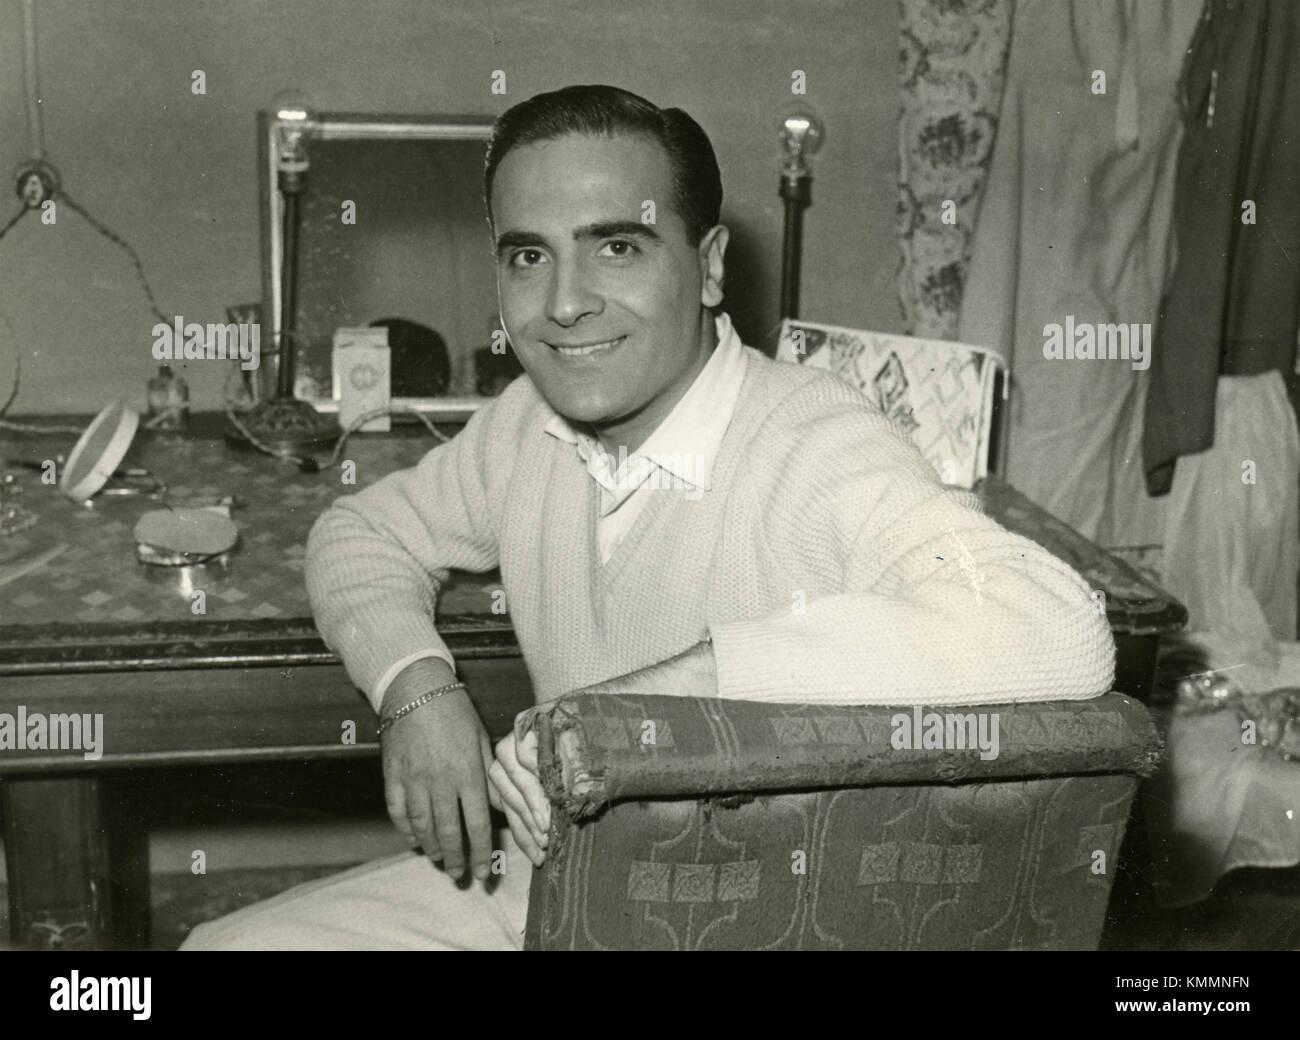 Giorgio, Unidentified theatrical actor, Italy 1954 - Stock Image